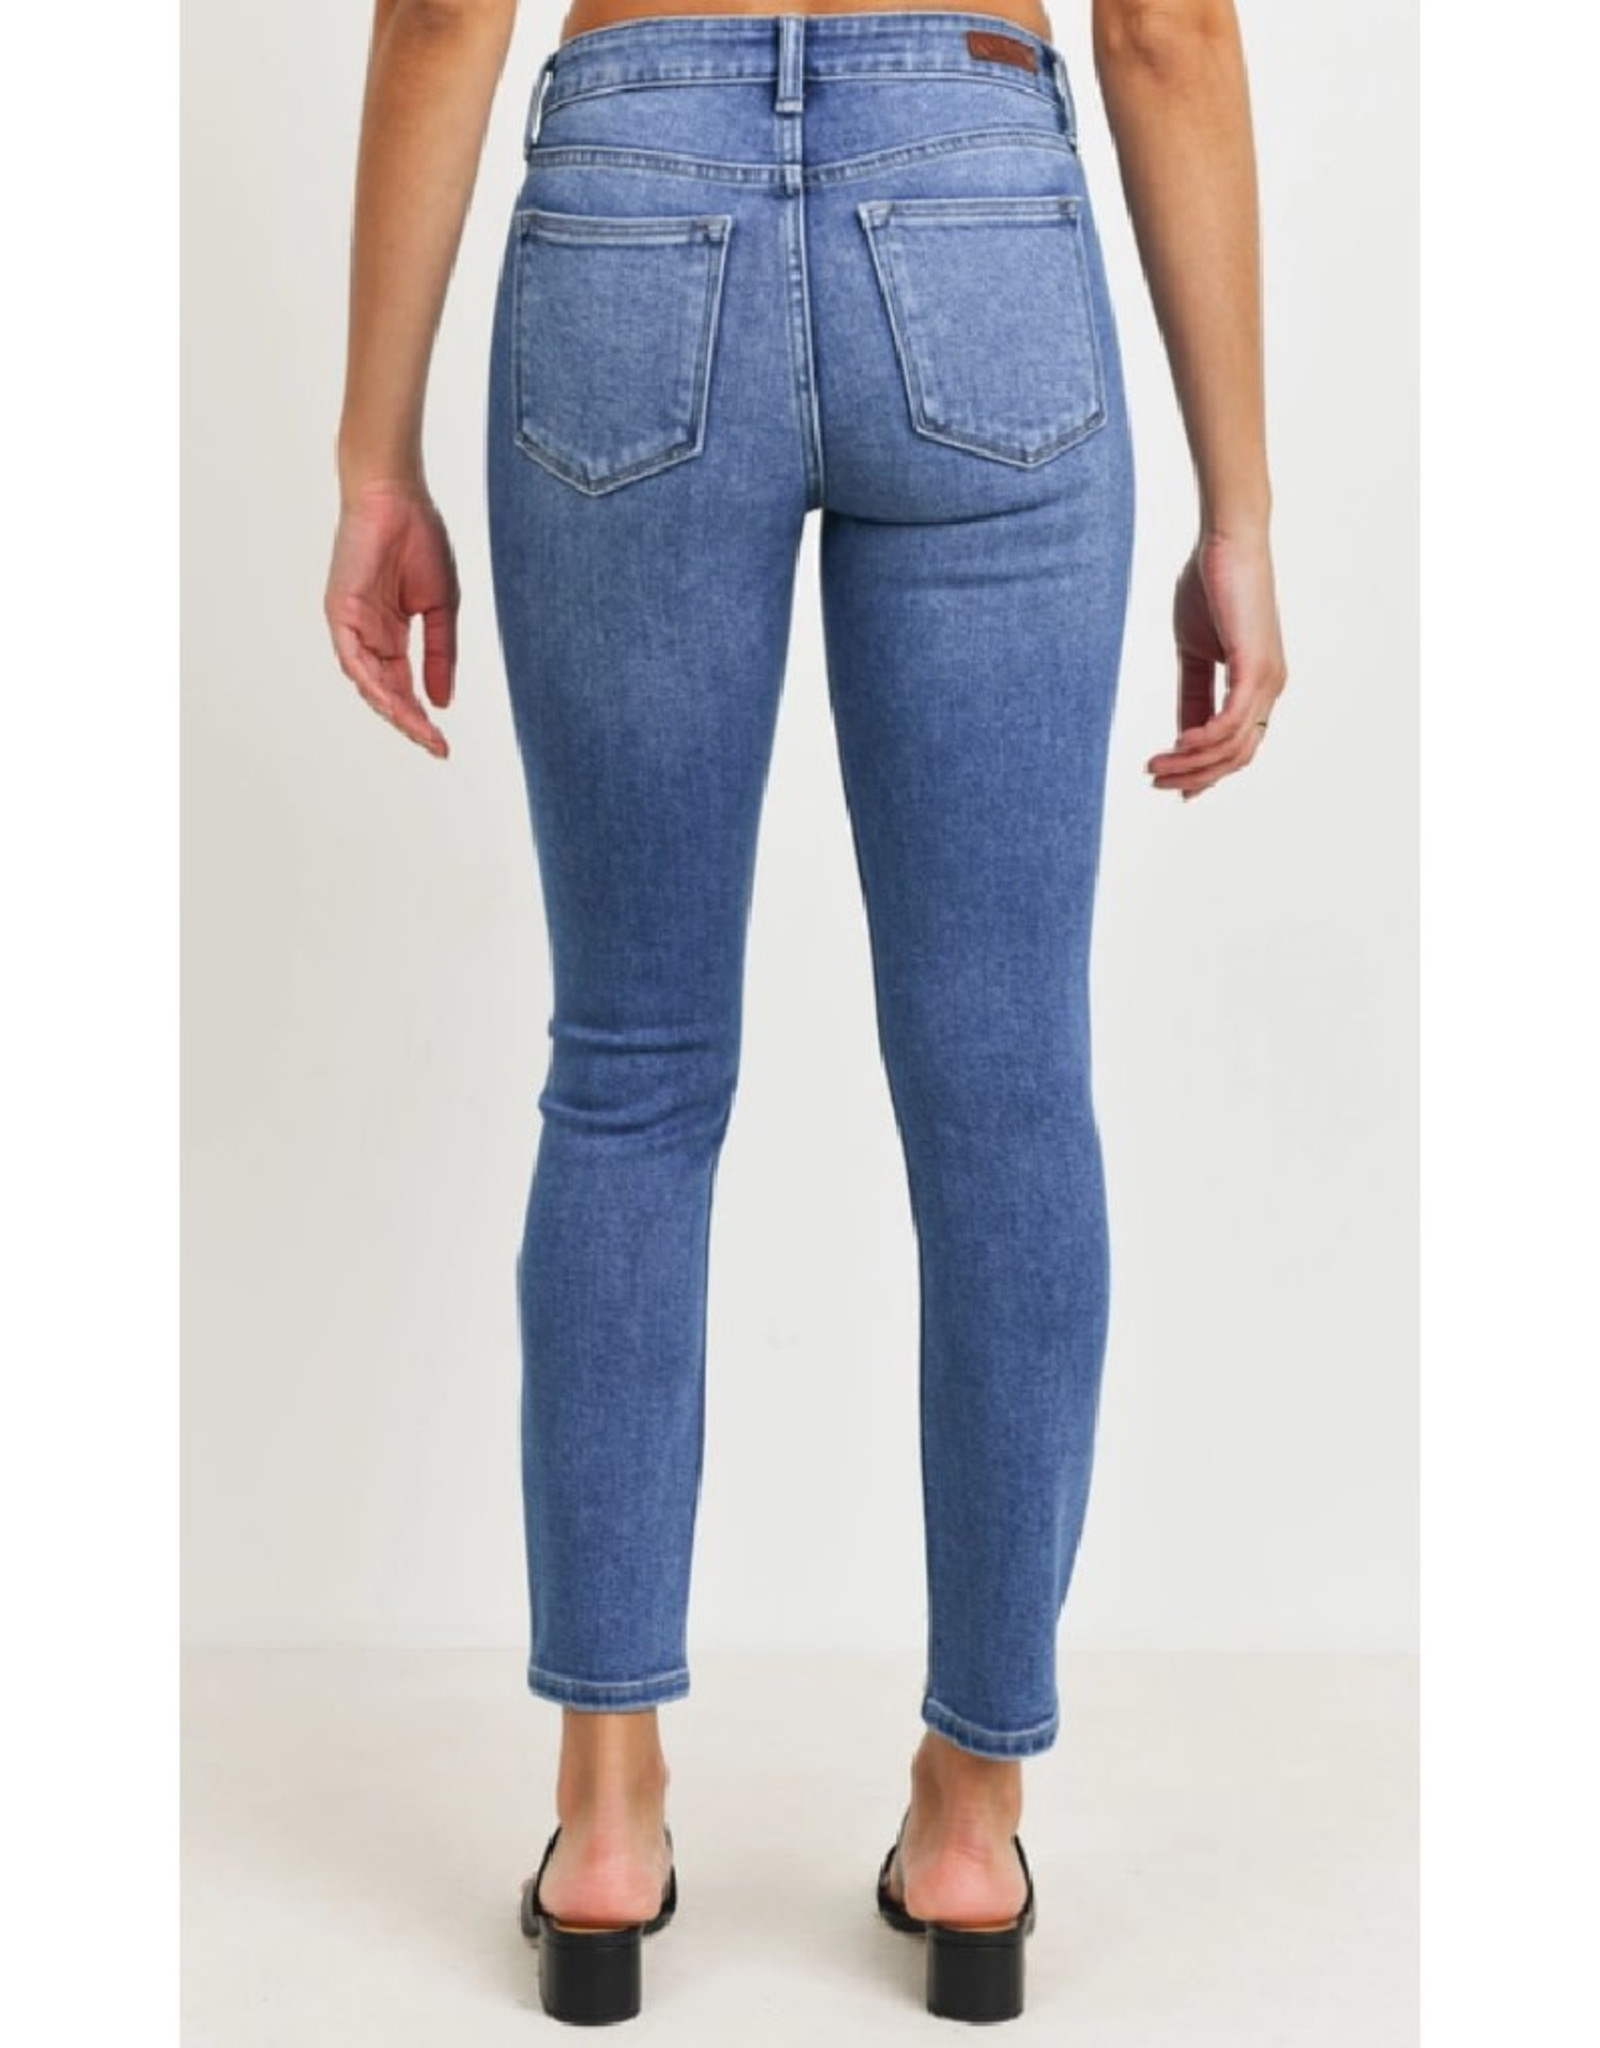 Skinny Jeans with Distressed Hem